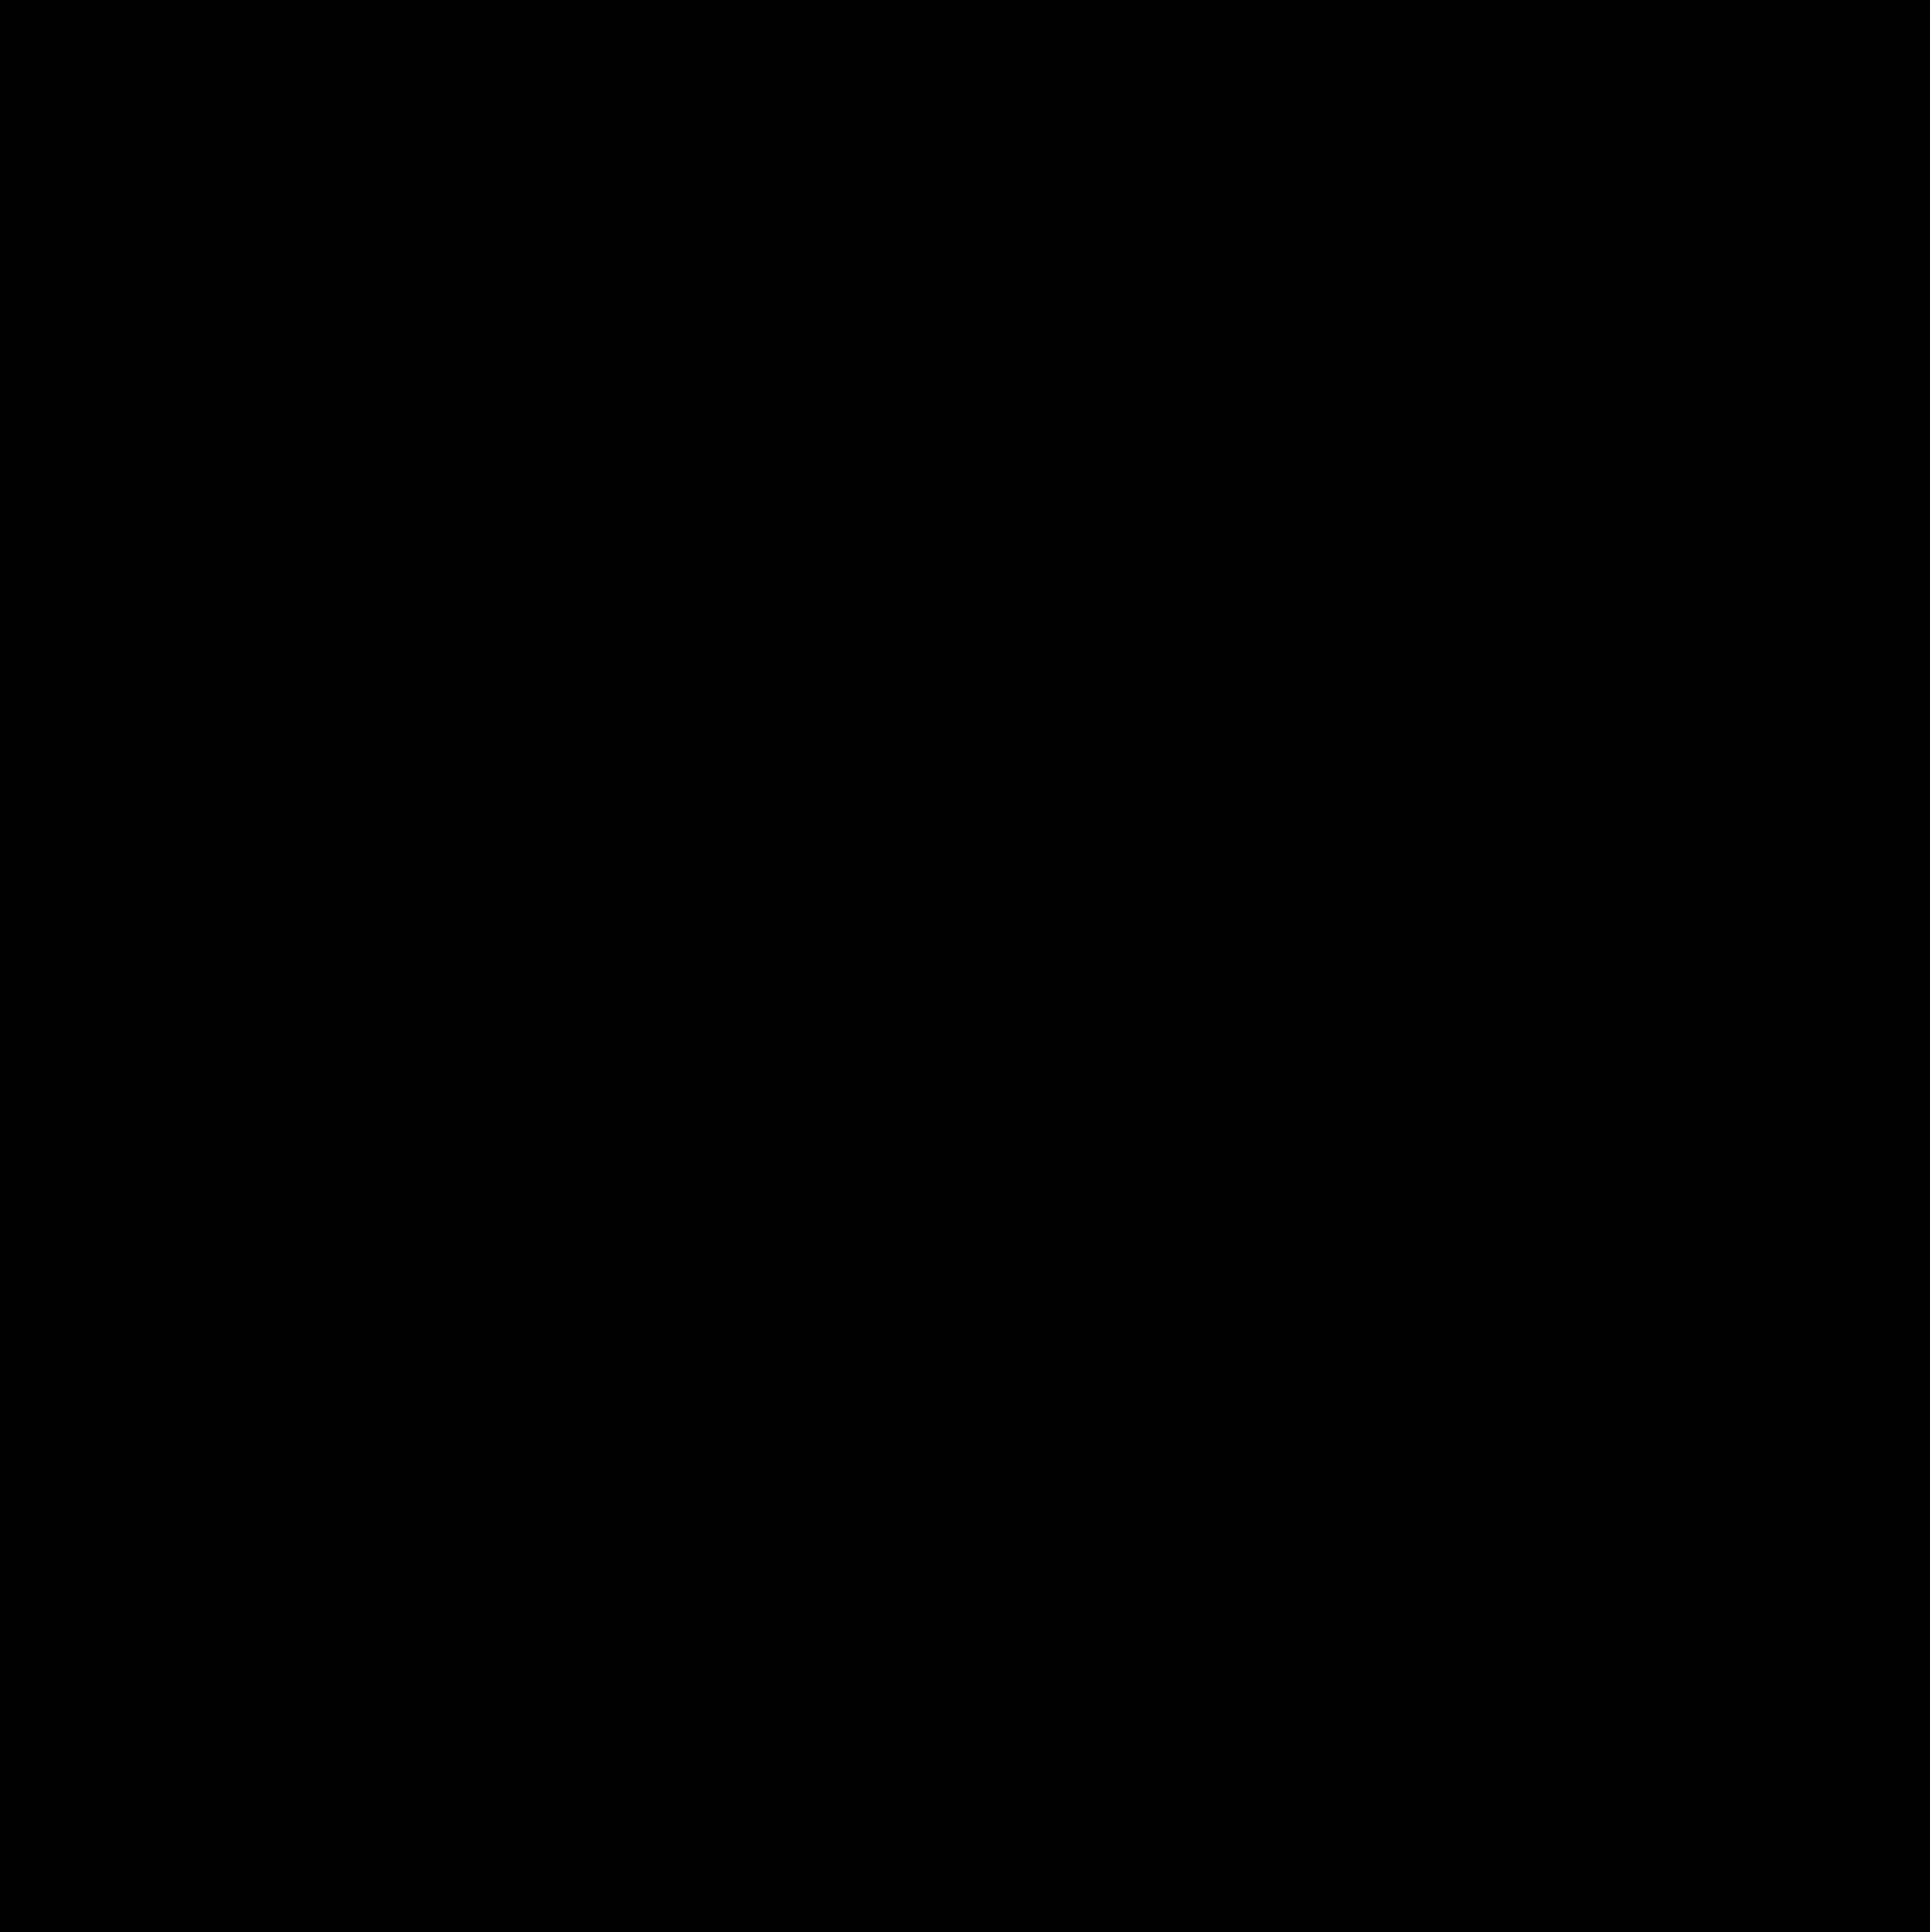 Star constellation clipart vector transparent stock Clipart - Hercules constellation vector transparent stock